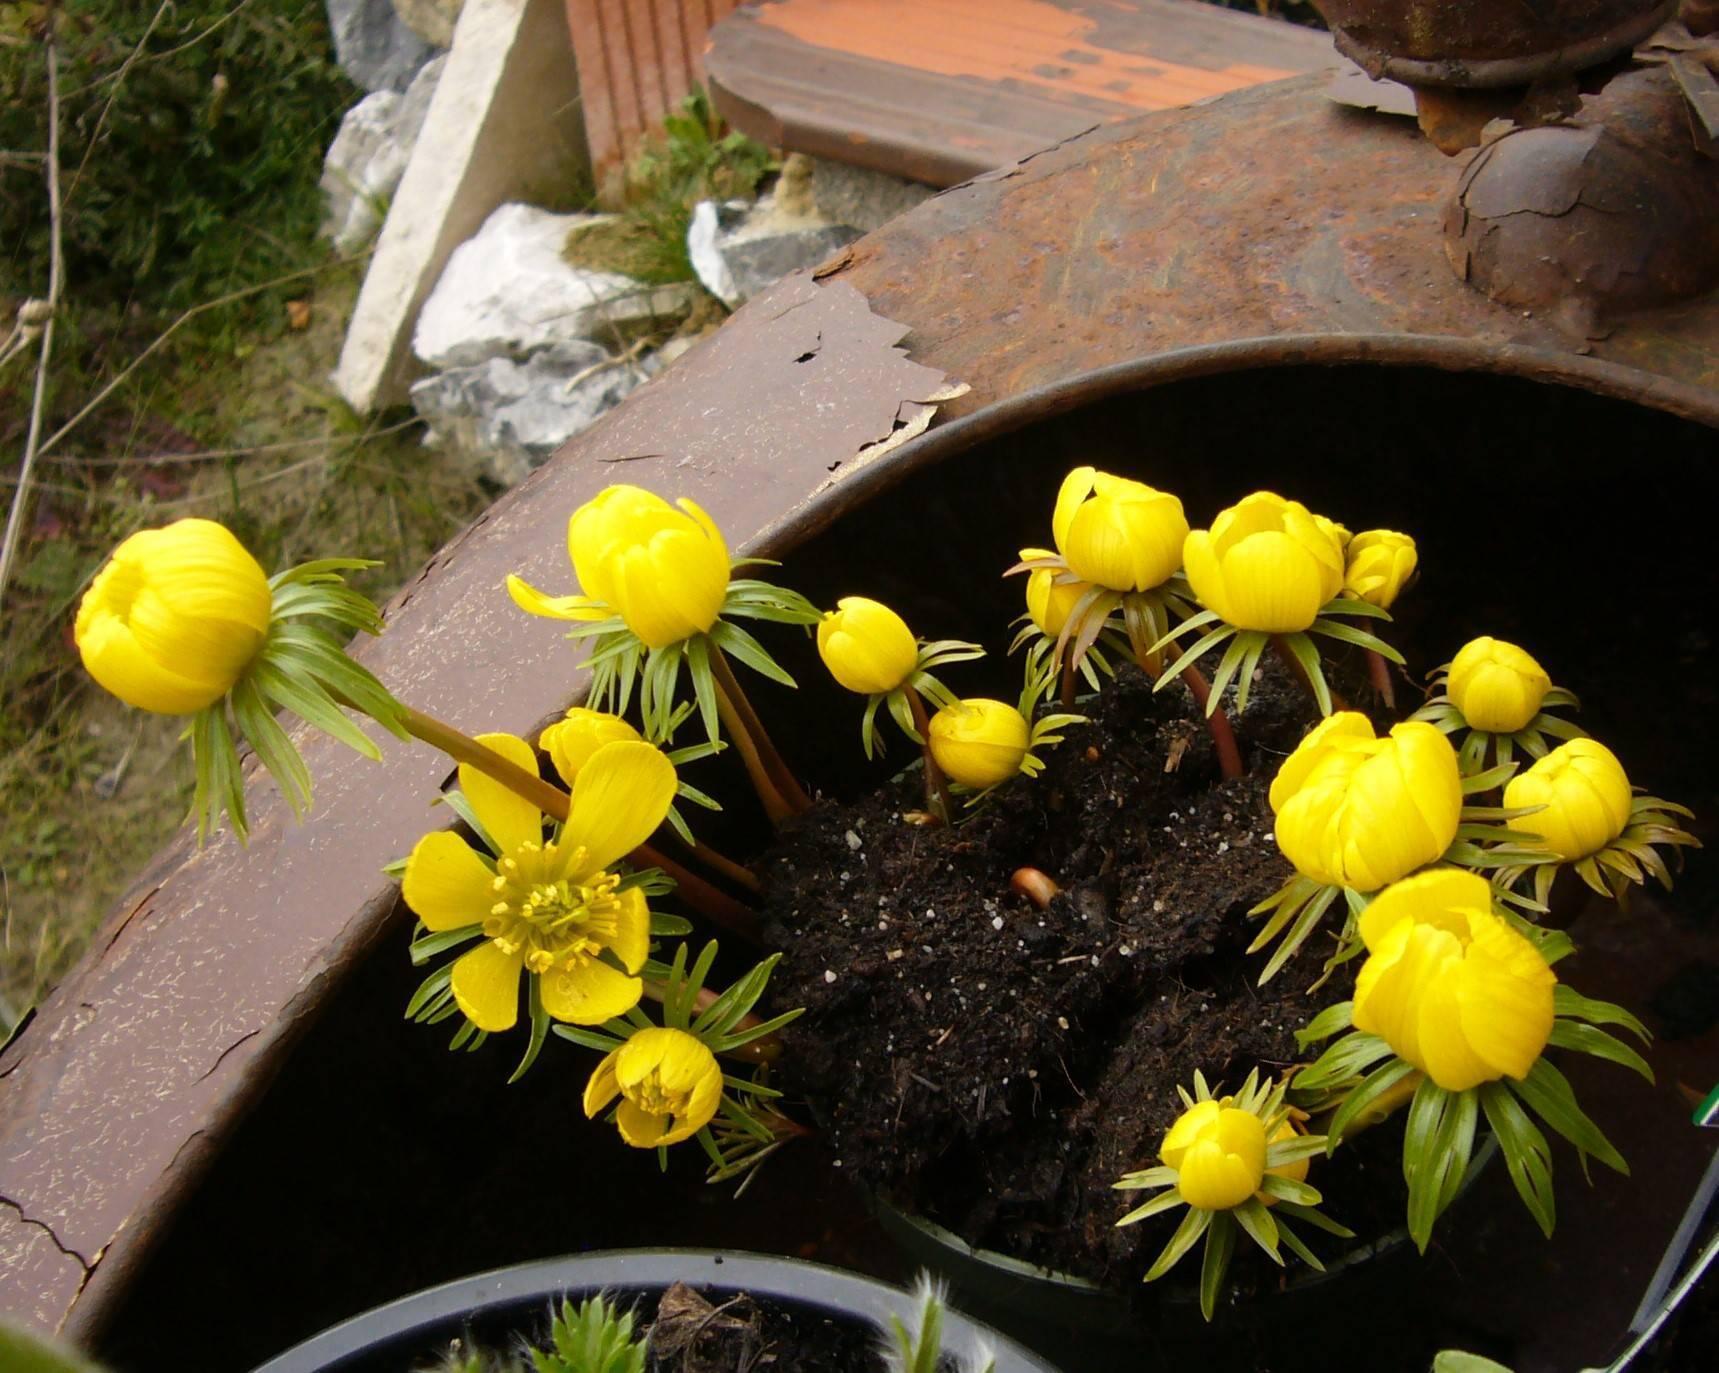 Naturschatz – Winterling (Eranthis hyemalis)